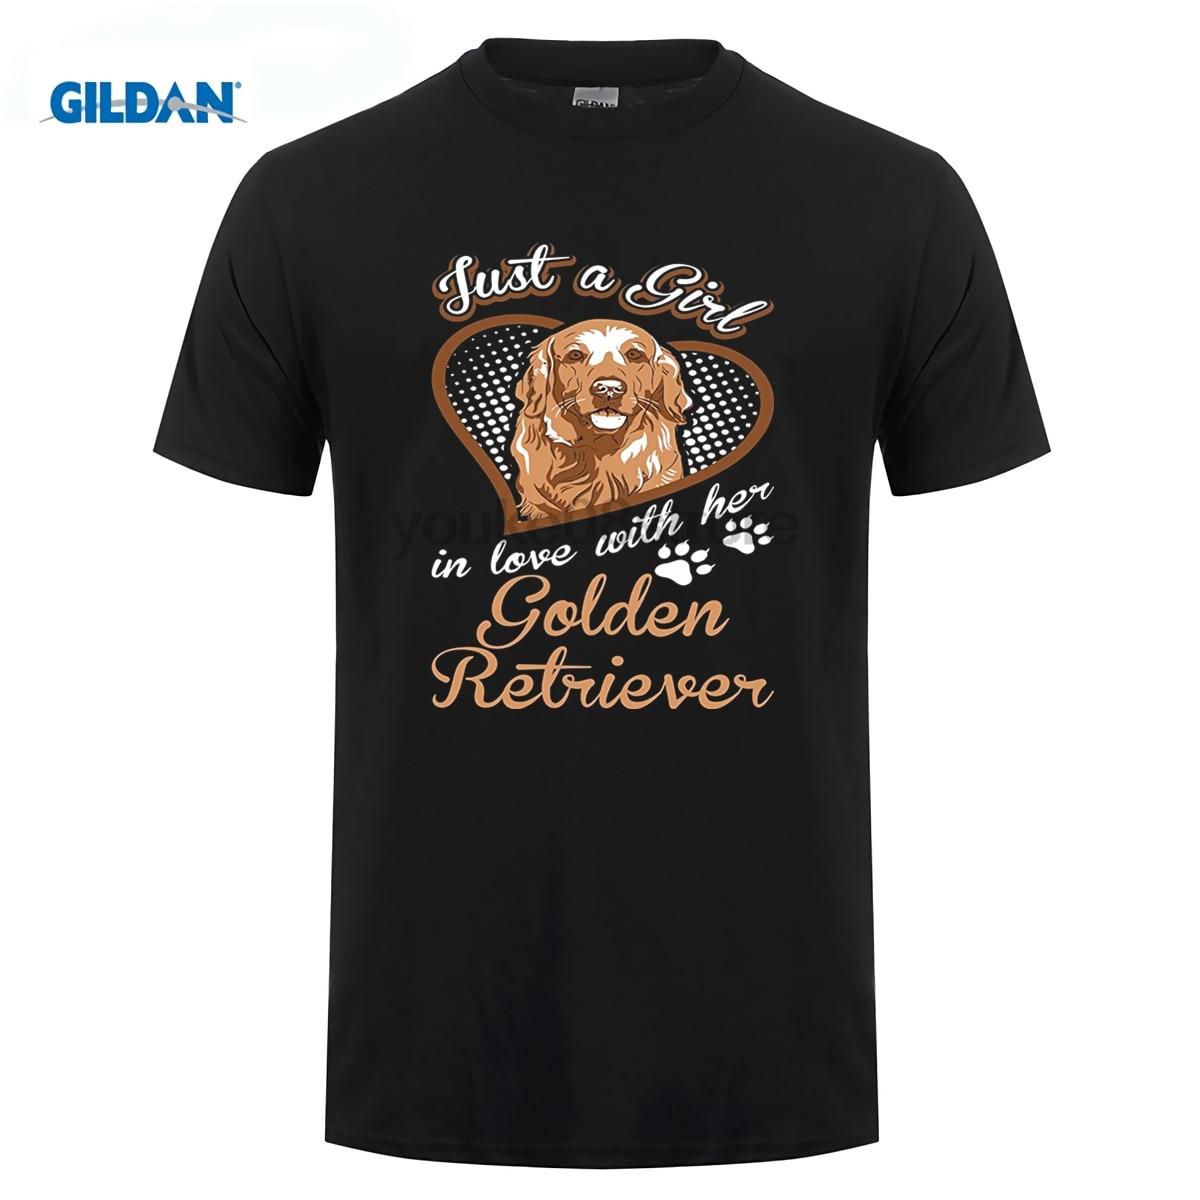 GILDAN 100% Cotton O-neck custom printed T-shirt Just A Girl In Love With Her Golden Retriever Dog TShirt